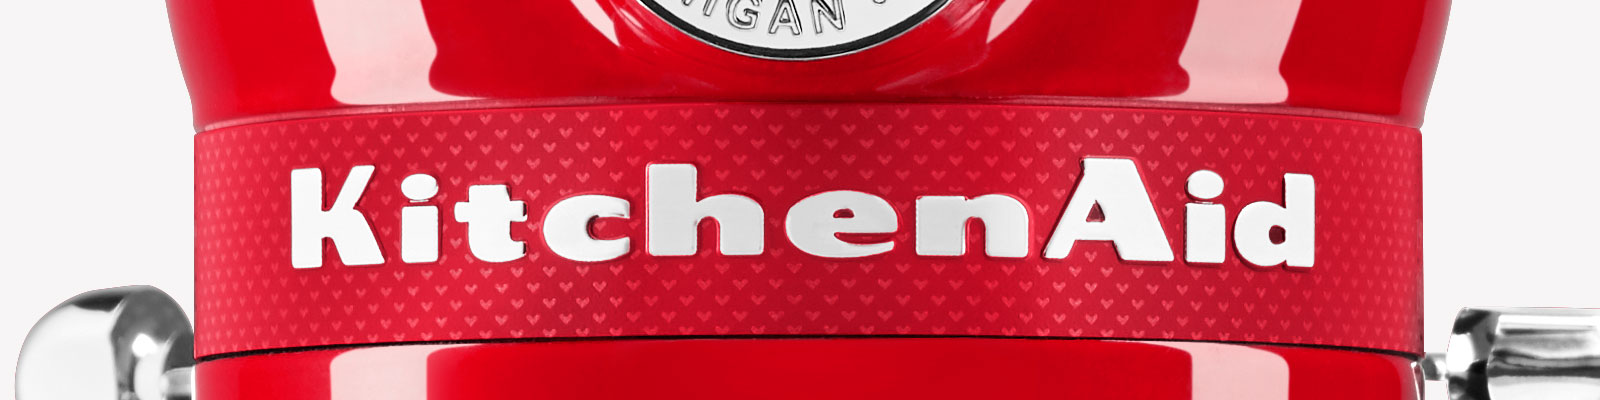 Kitchenaid Passion Red Ramershoven Com